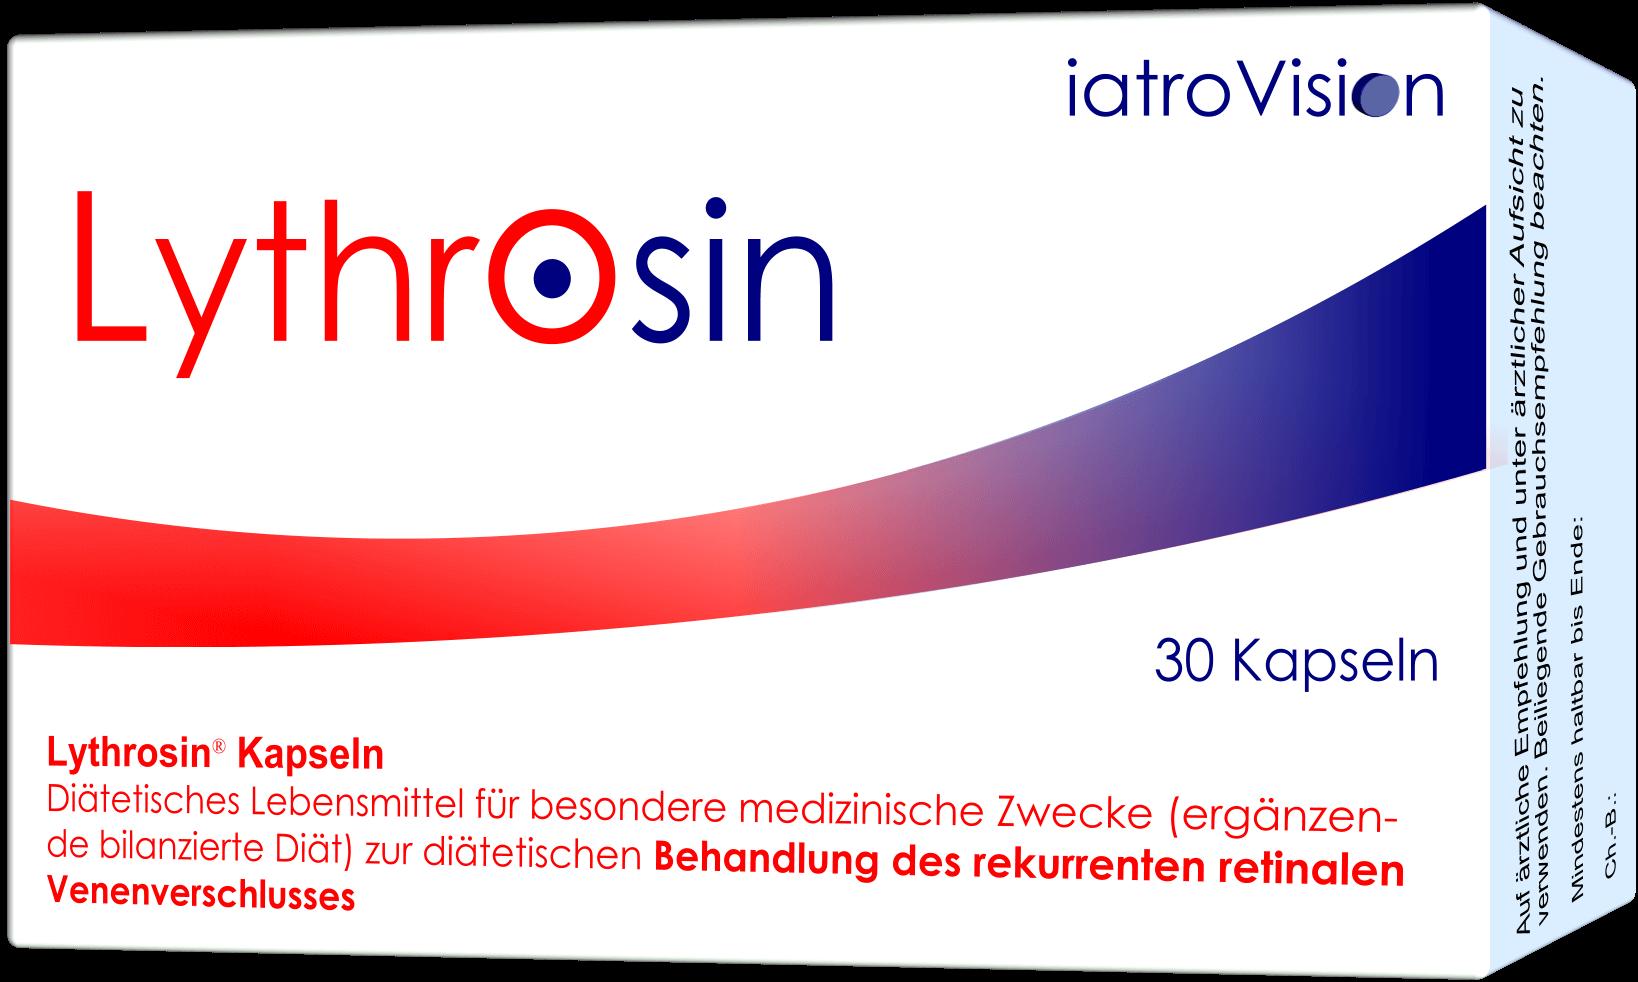 Lythrosin Kapseln Rekurrenz bei retinalem Venenverschluss verringern